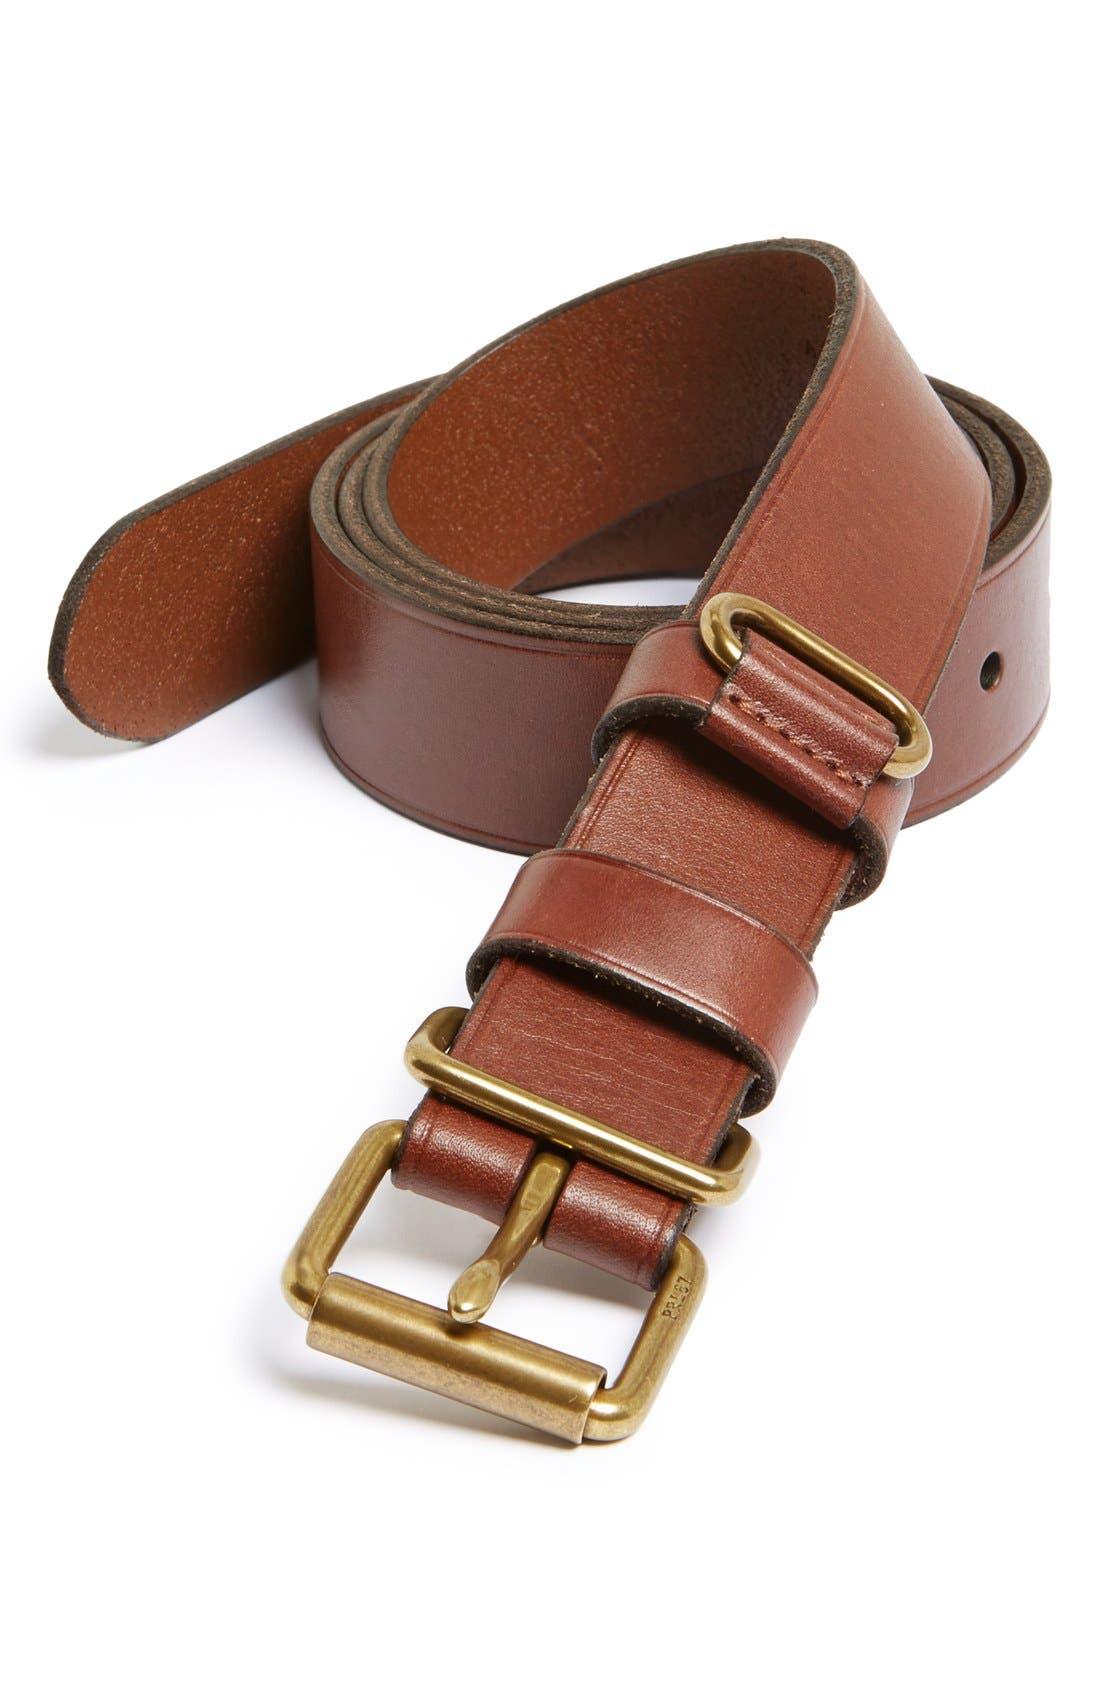 Alternate Image 1 Selected - Polo Ralph Lauren 'Suffolk' Leather Belt